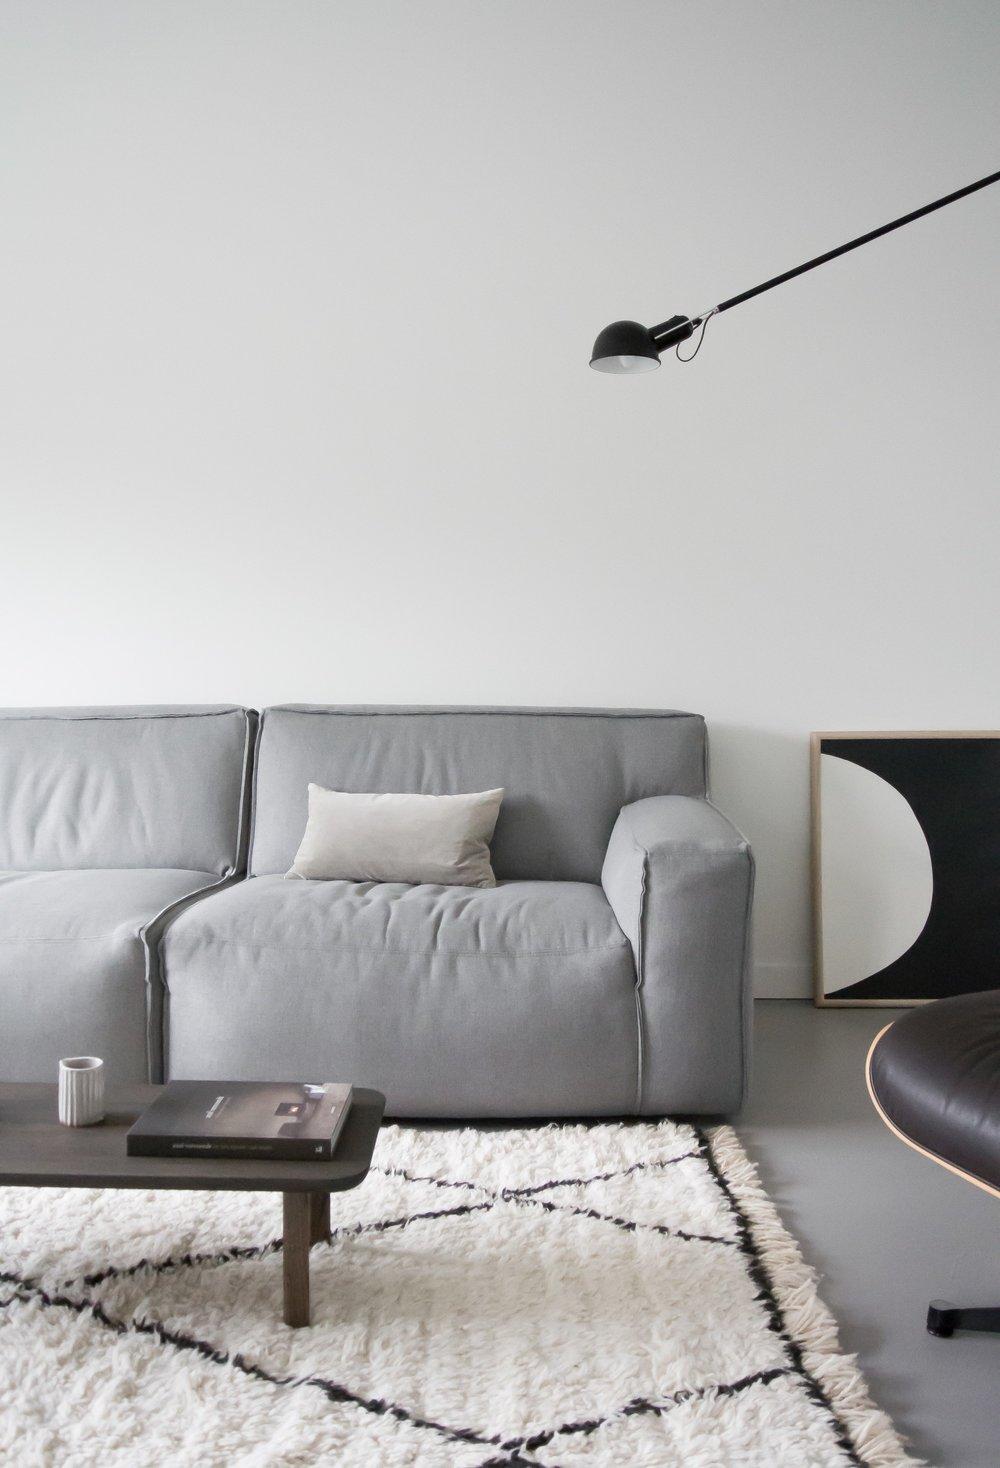 Flow wall lamp at home aprilandmay